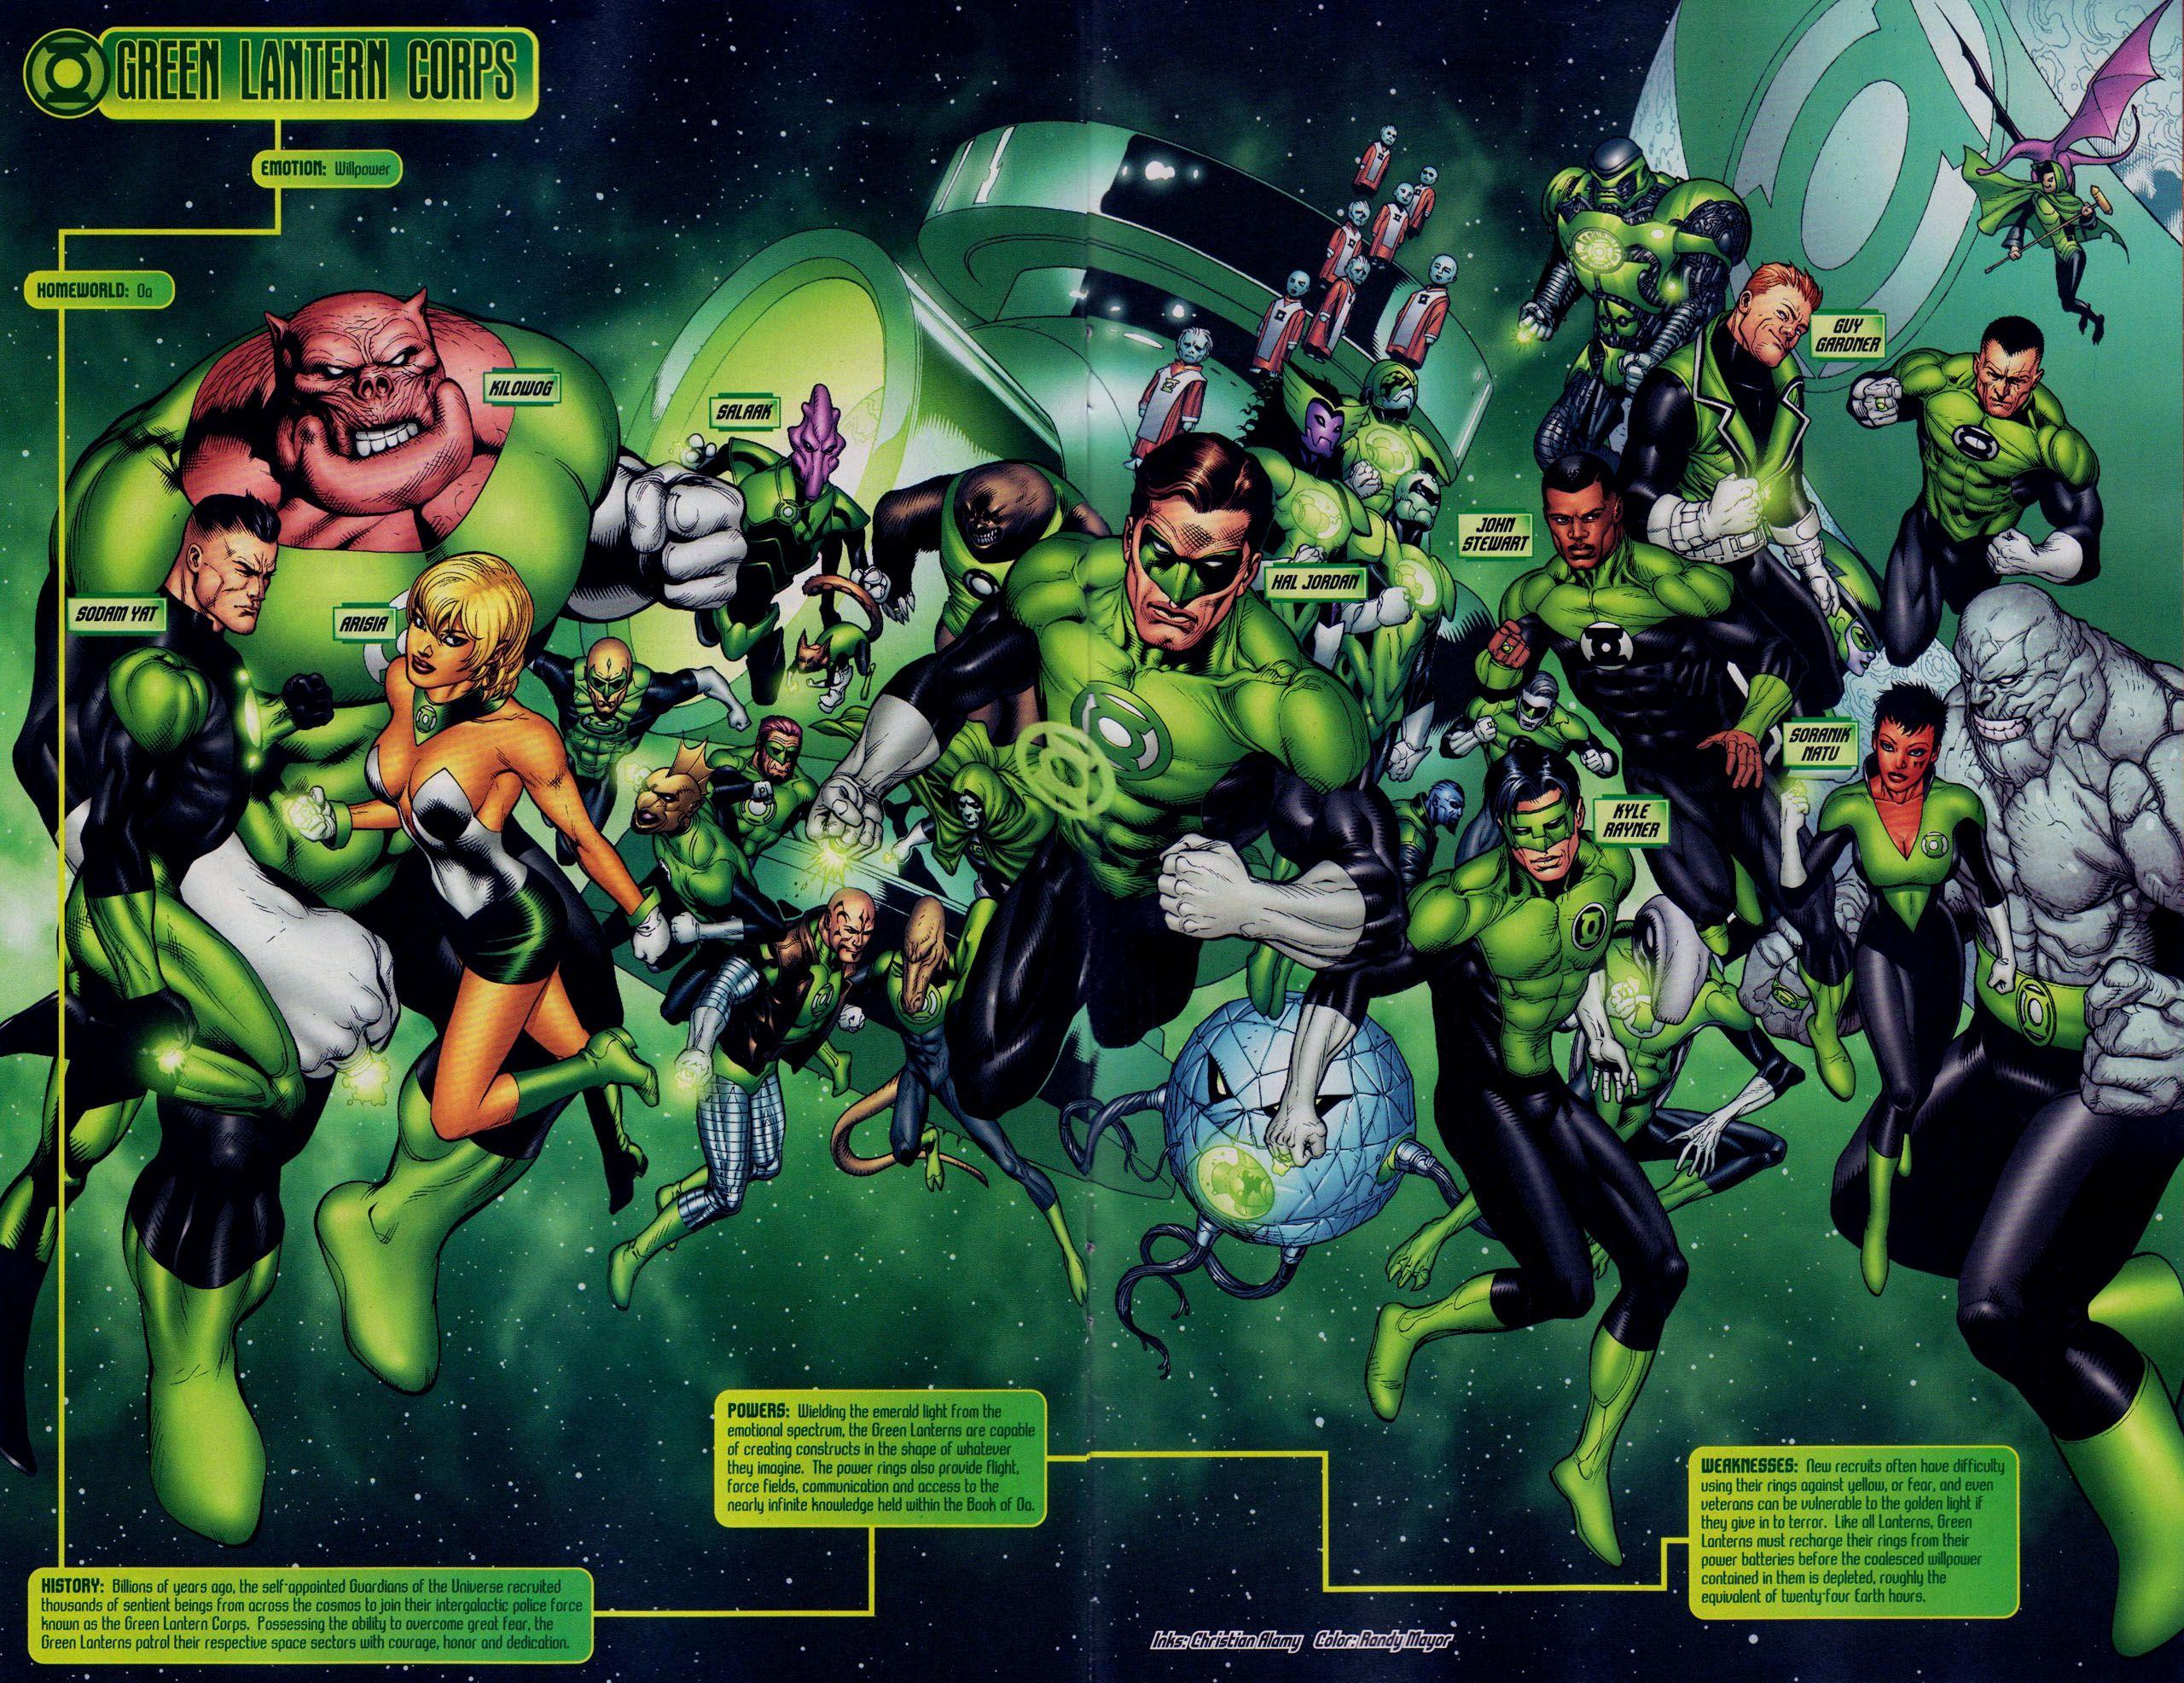 Green Lantern Corps Wallpapers   Top Green Lantern Corps 2560x1973